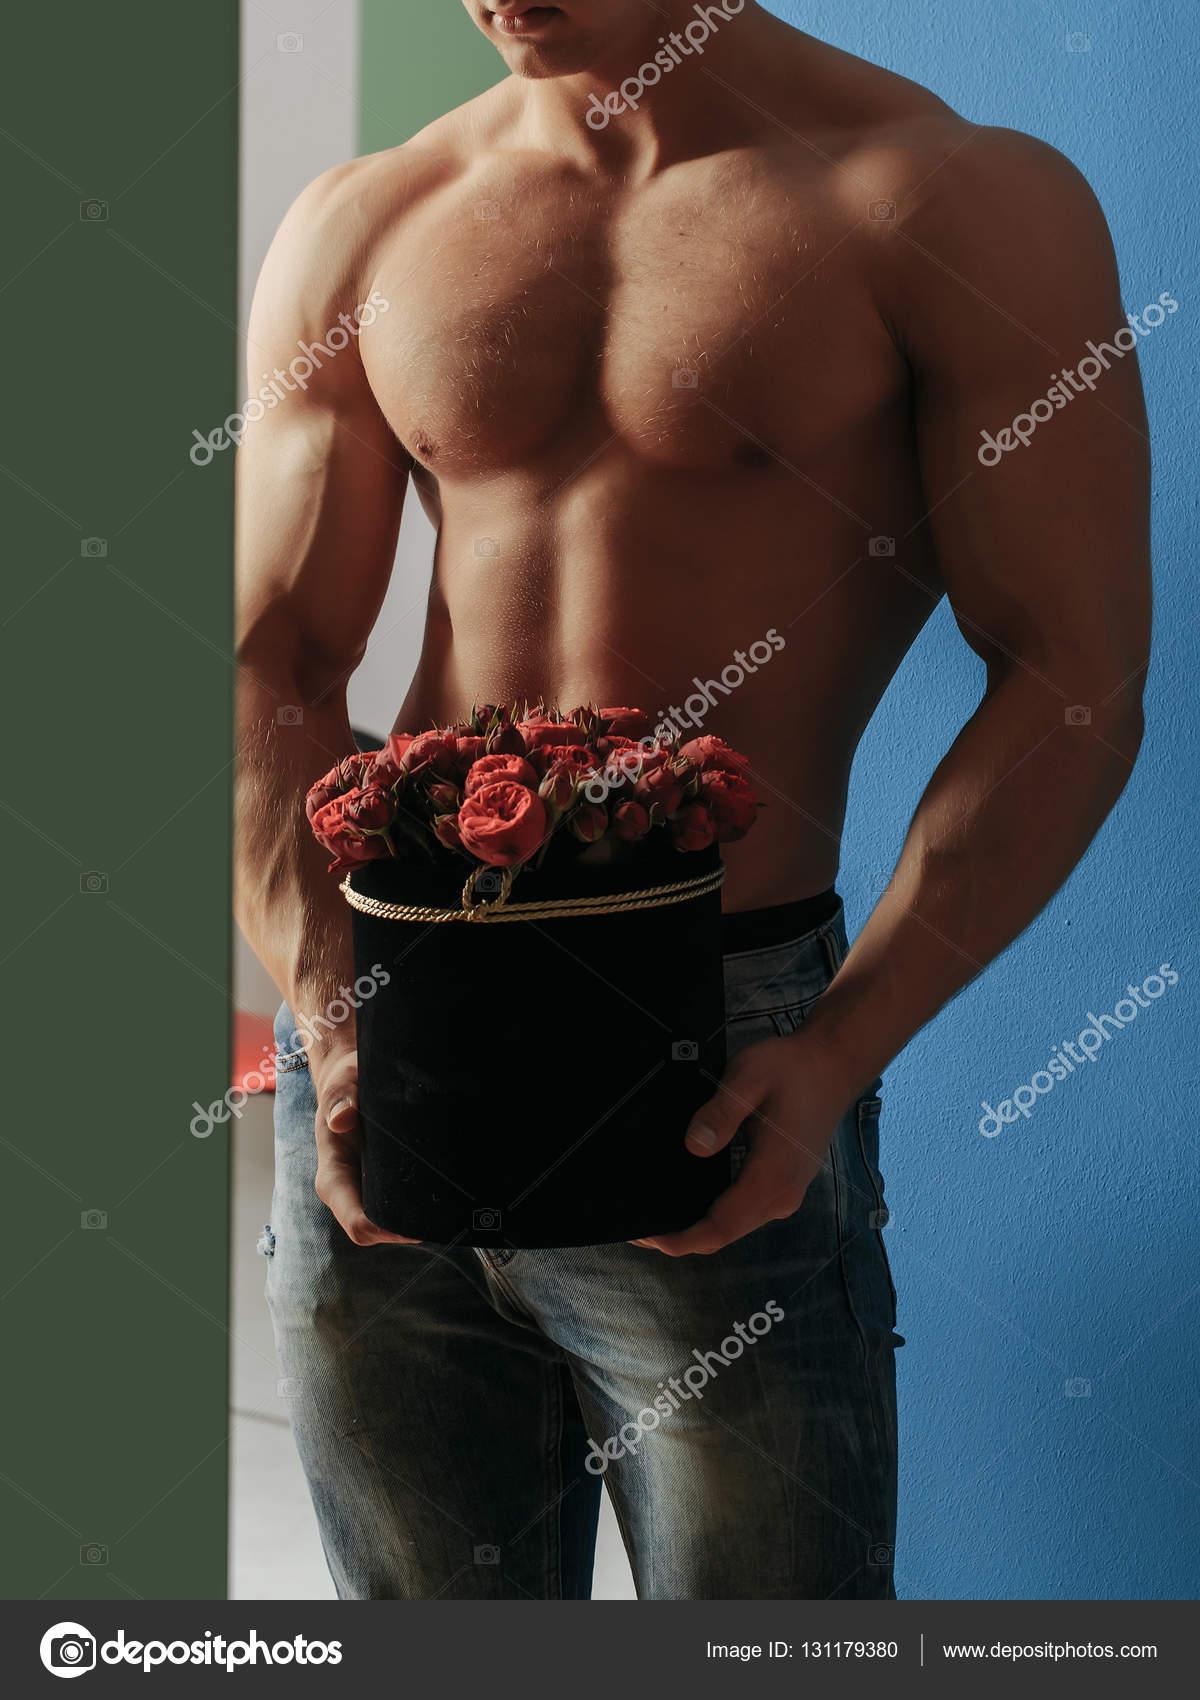 rot-sadovnik-i-golaya-zhena-fallos-porno